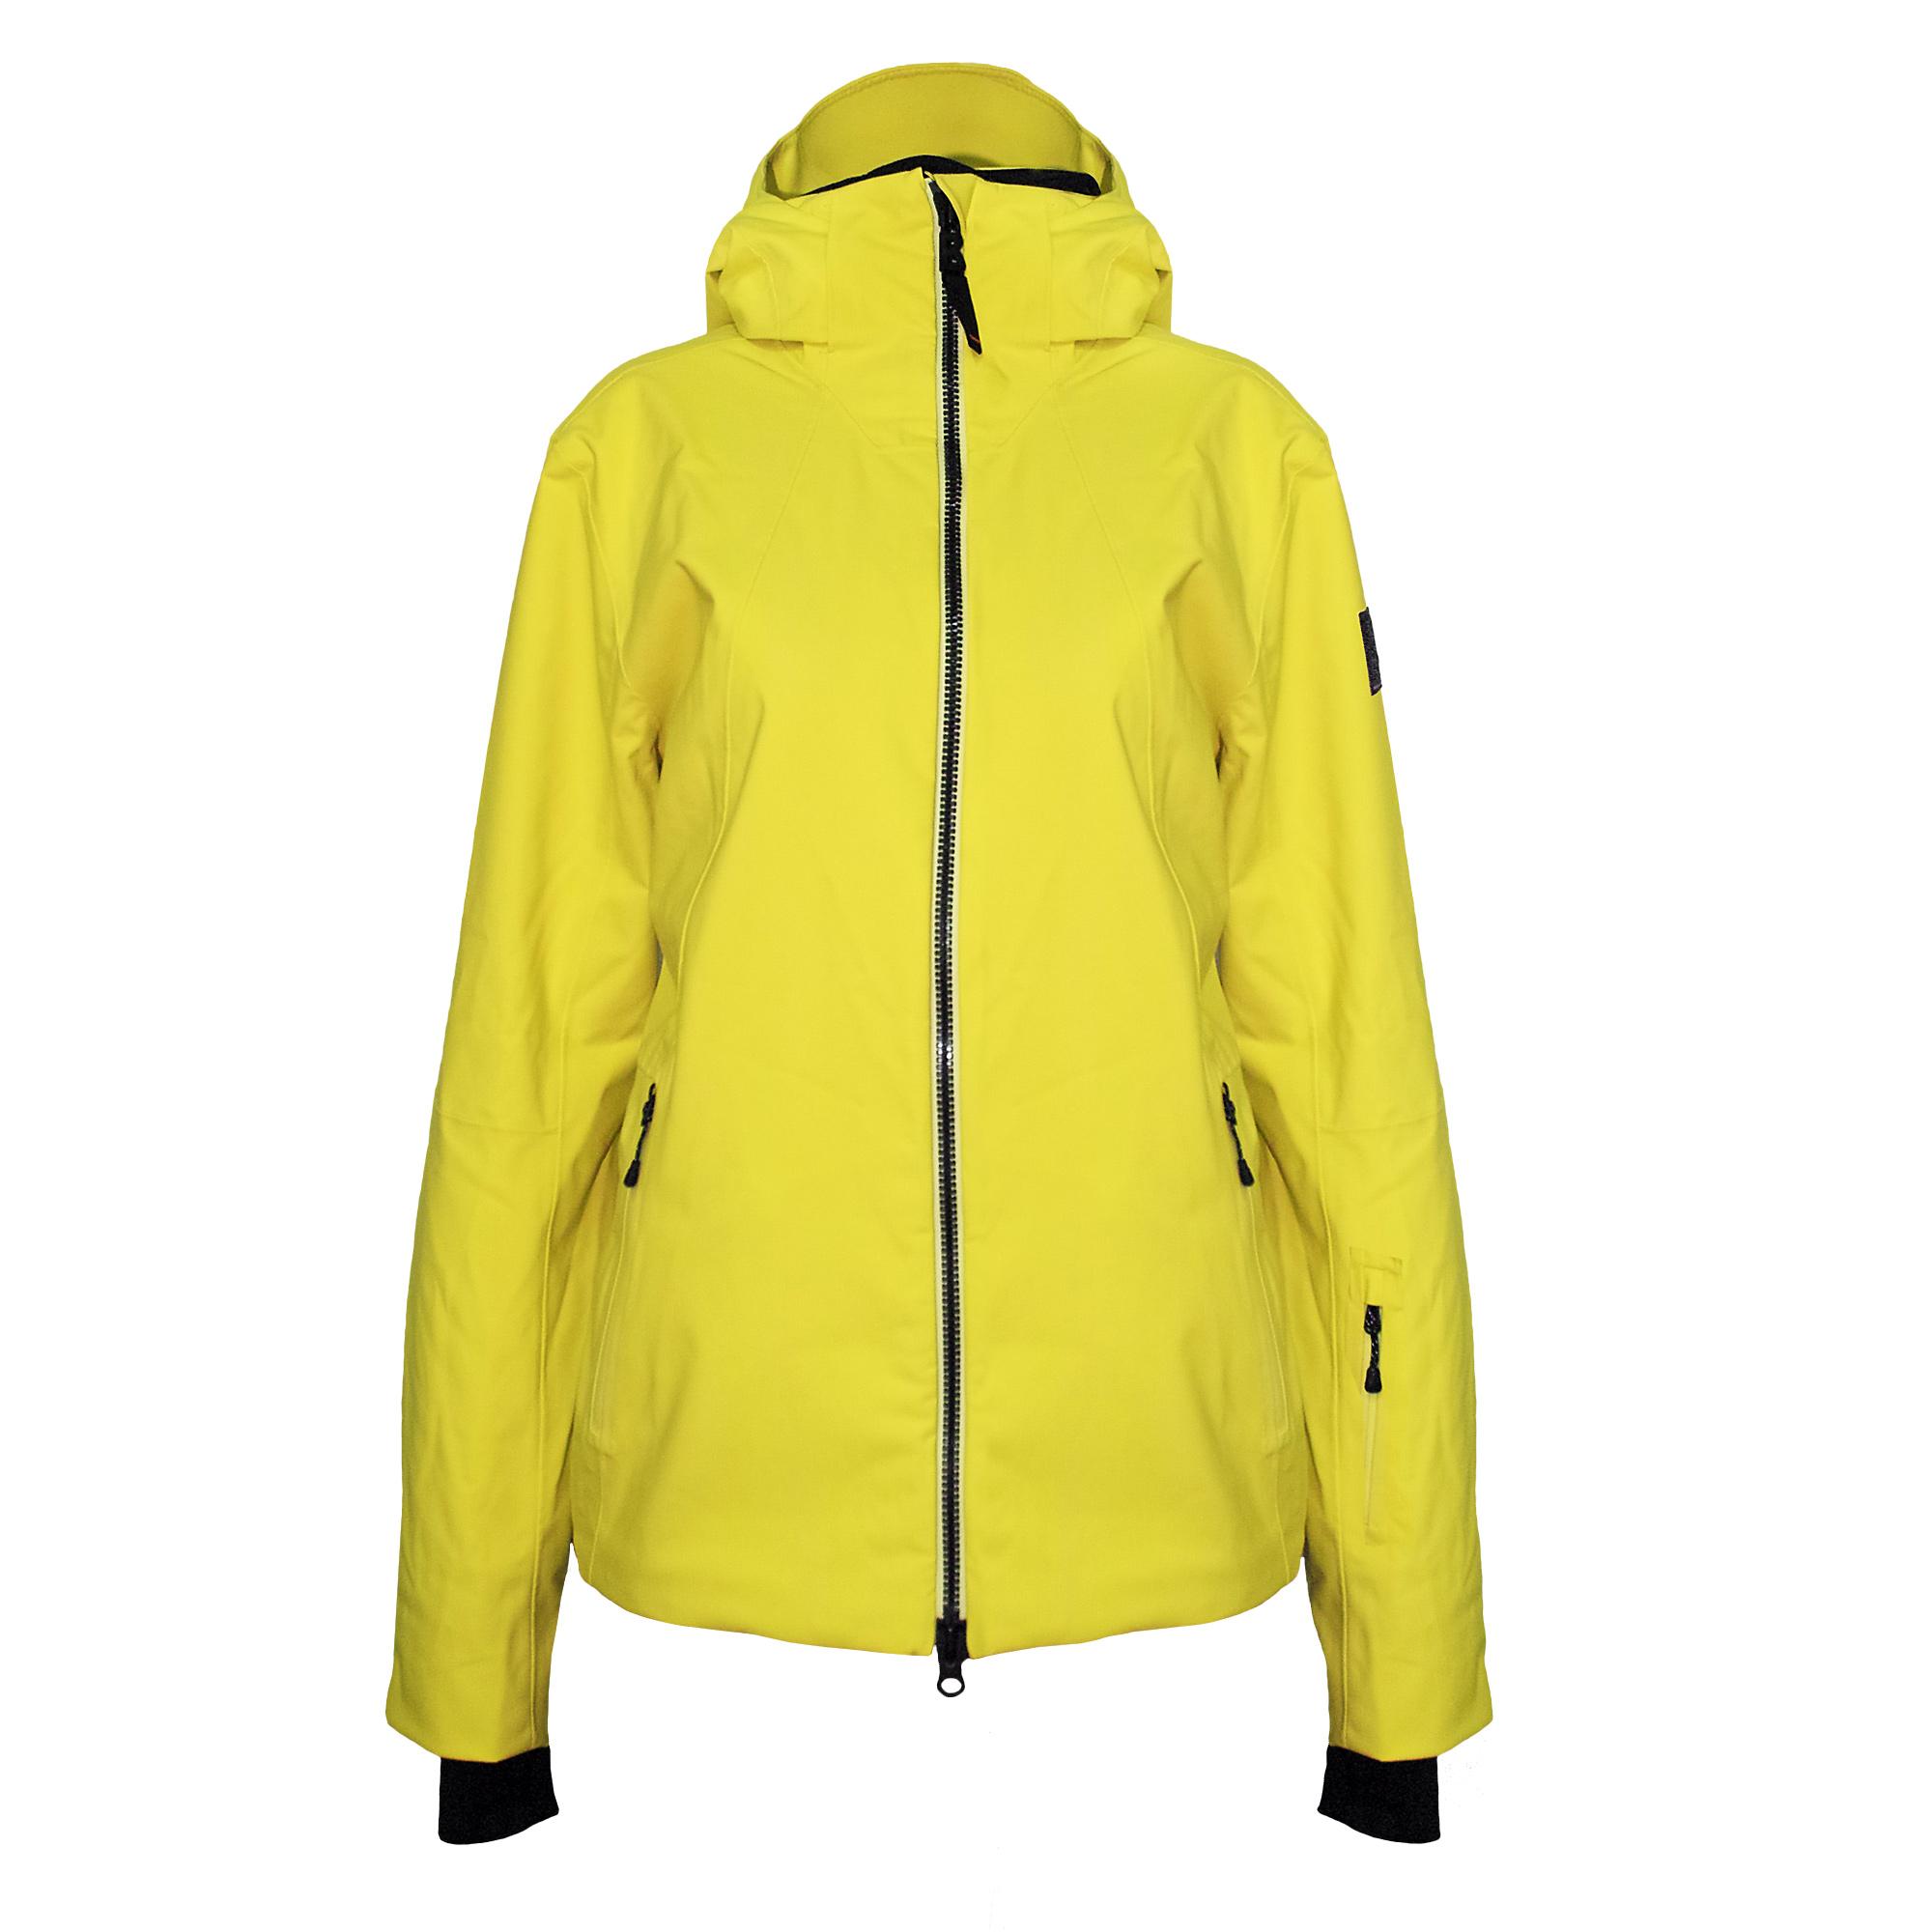 Fabrik glatt attraktive Mode Bogner Fire + Ice Charlene 18/19 - Damen Skijacke Snowboard Jacke - 3484  4901-045 gelb